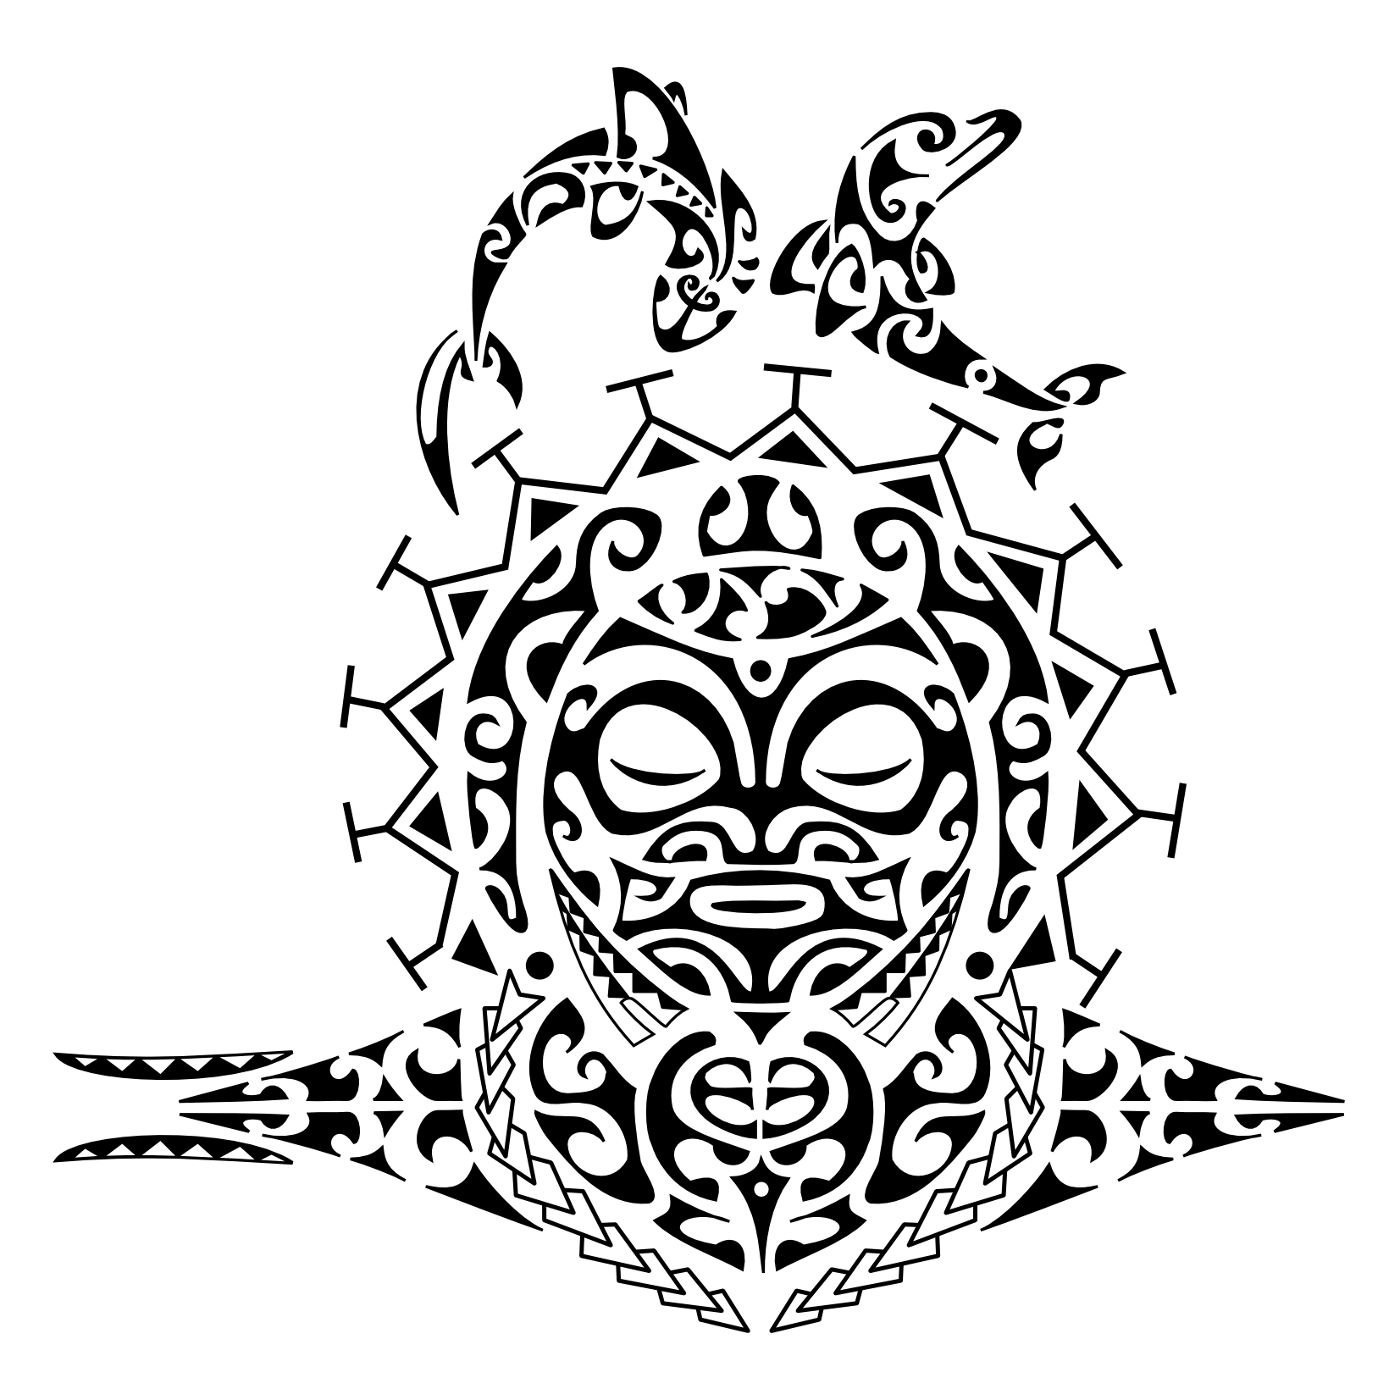 Créer Son Tatouage Polynésien - Comment choisir votre tatouage polynesien Tahiti Tatou